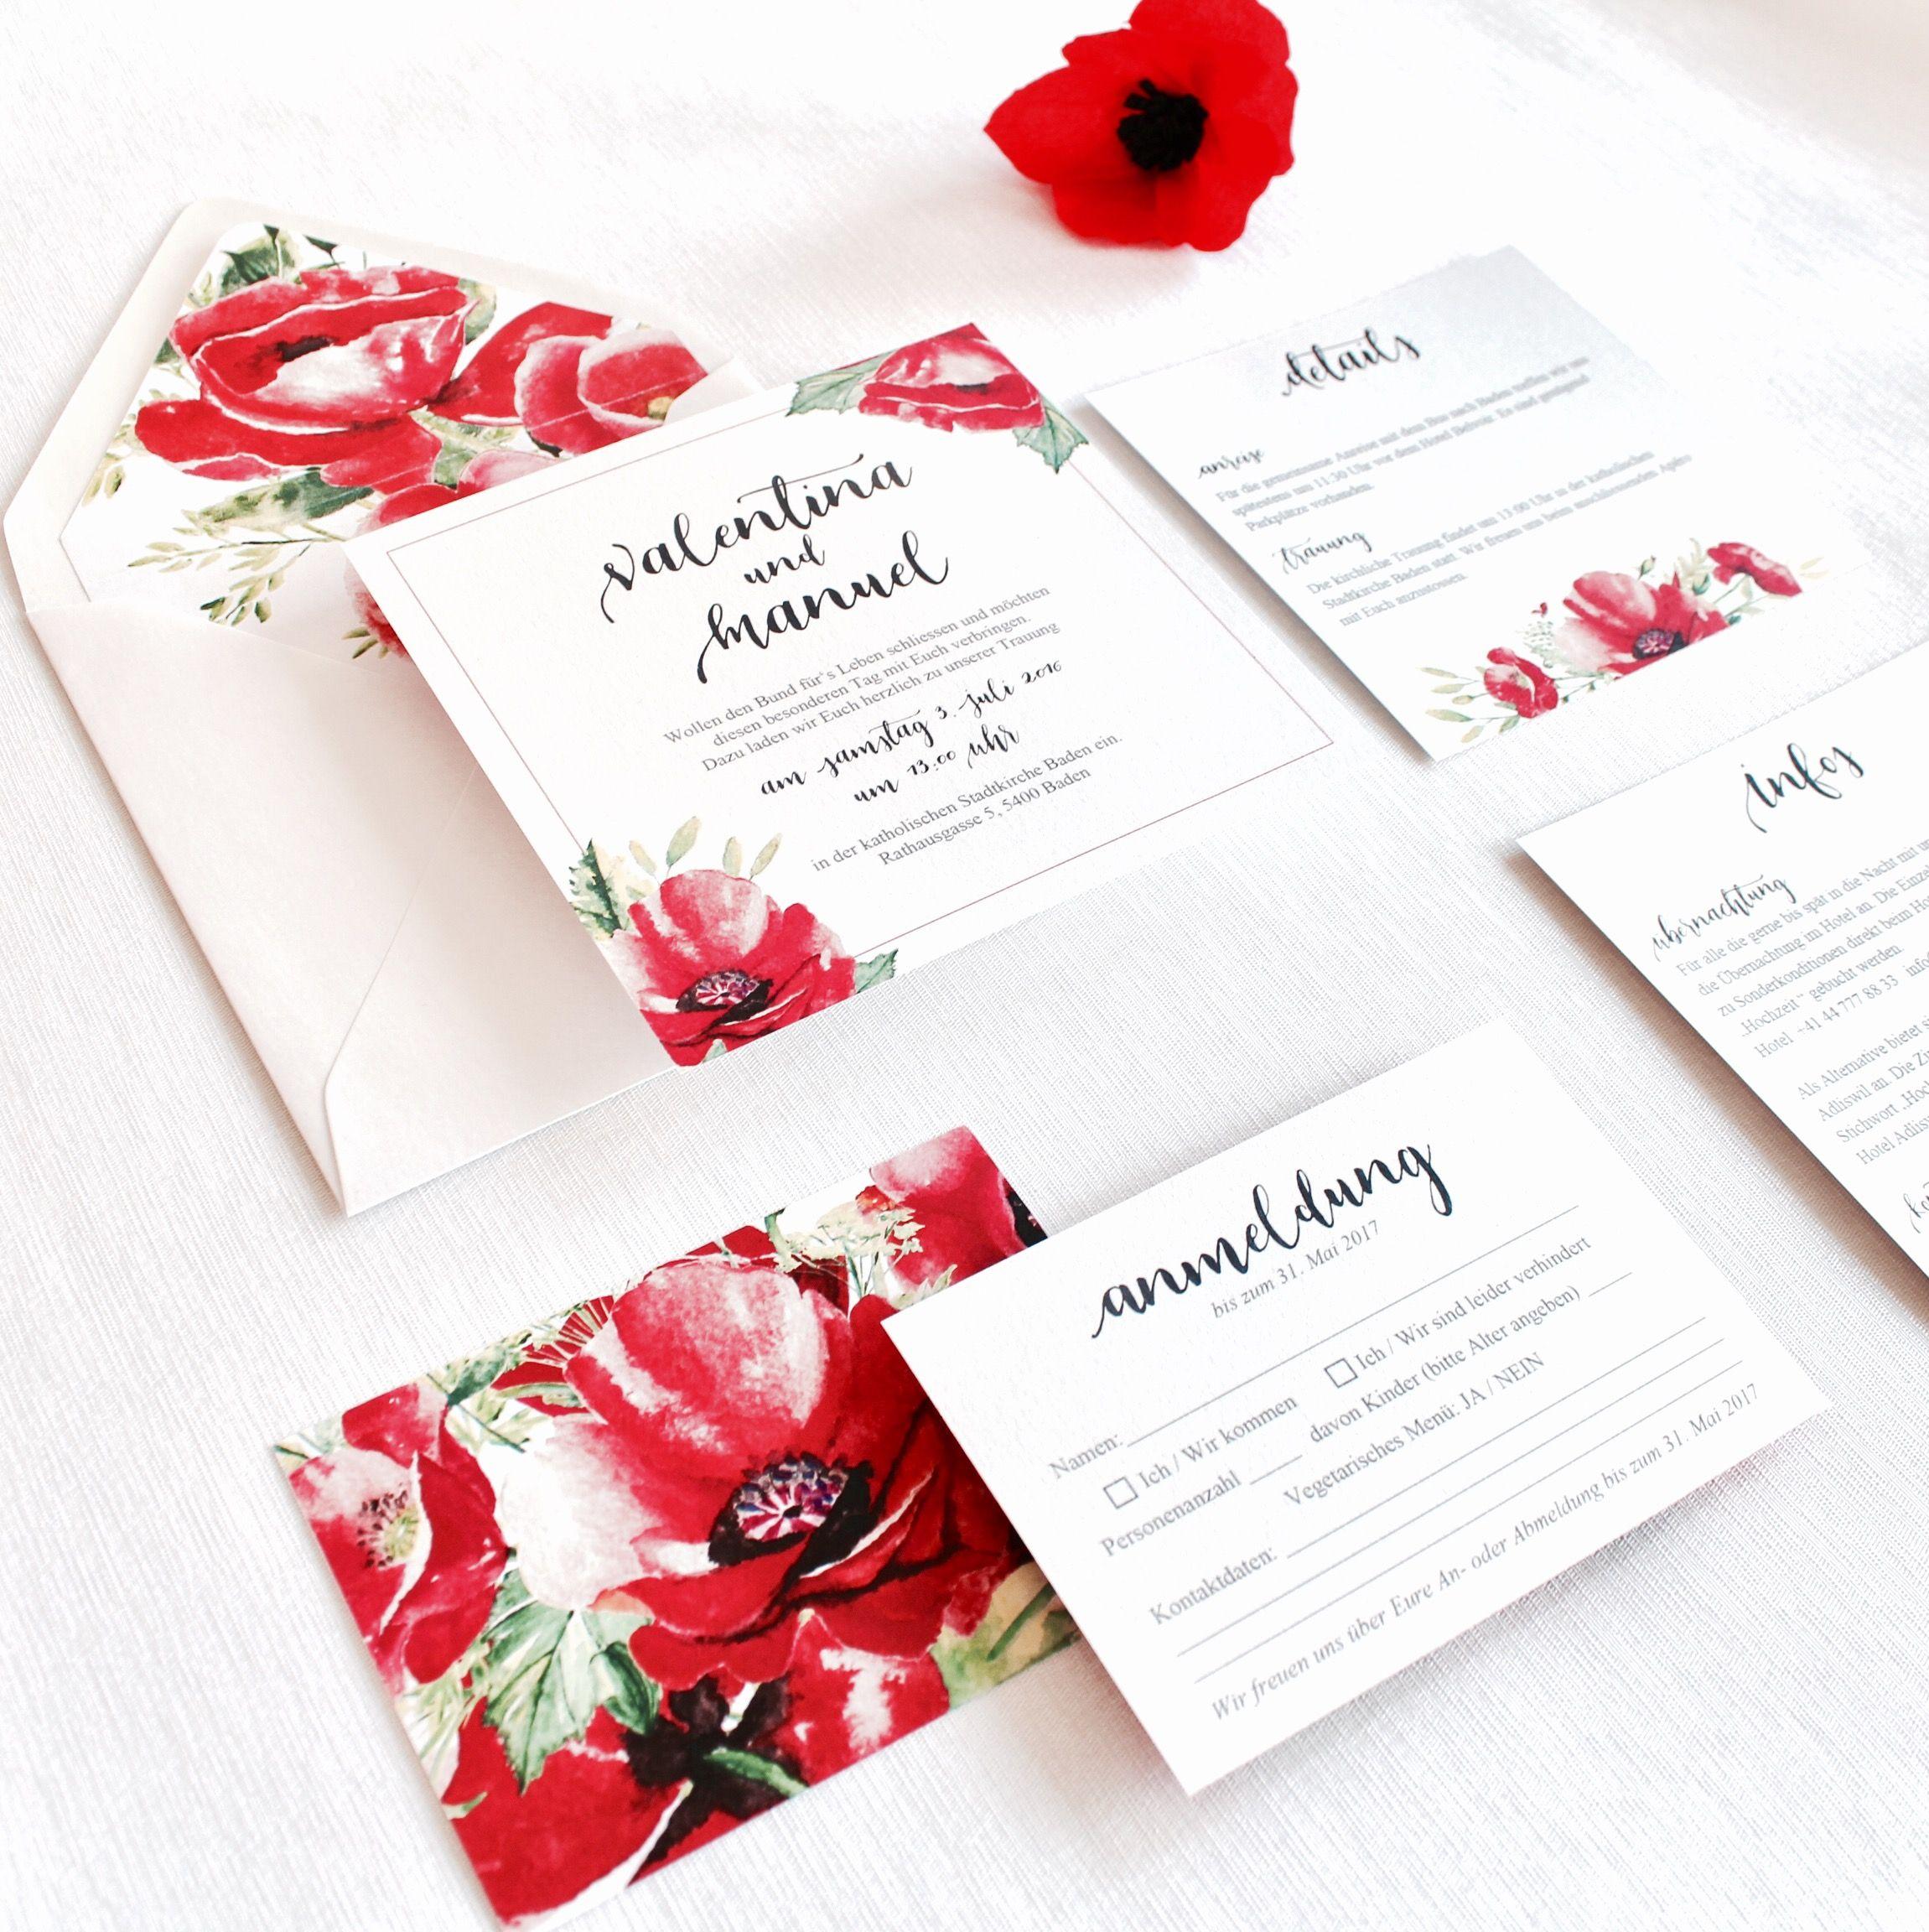 Pin By Blattpapier Studio On Red Poppy Pinterest Calligraphy